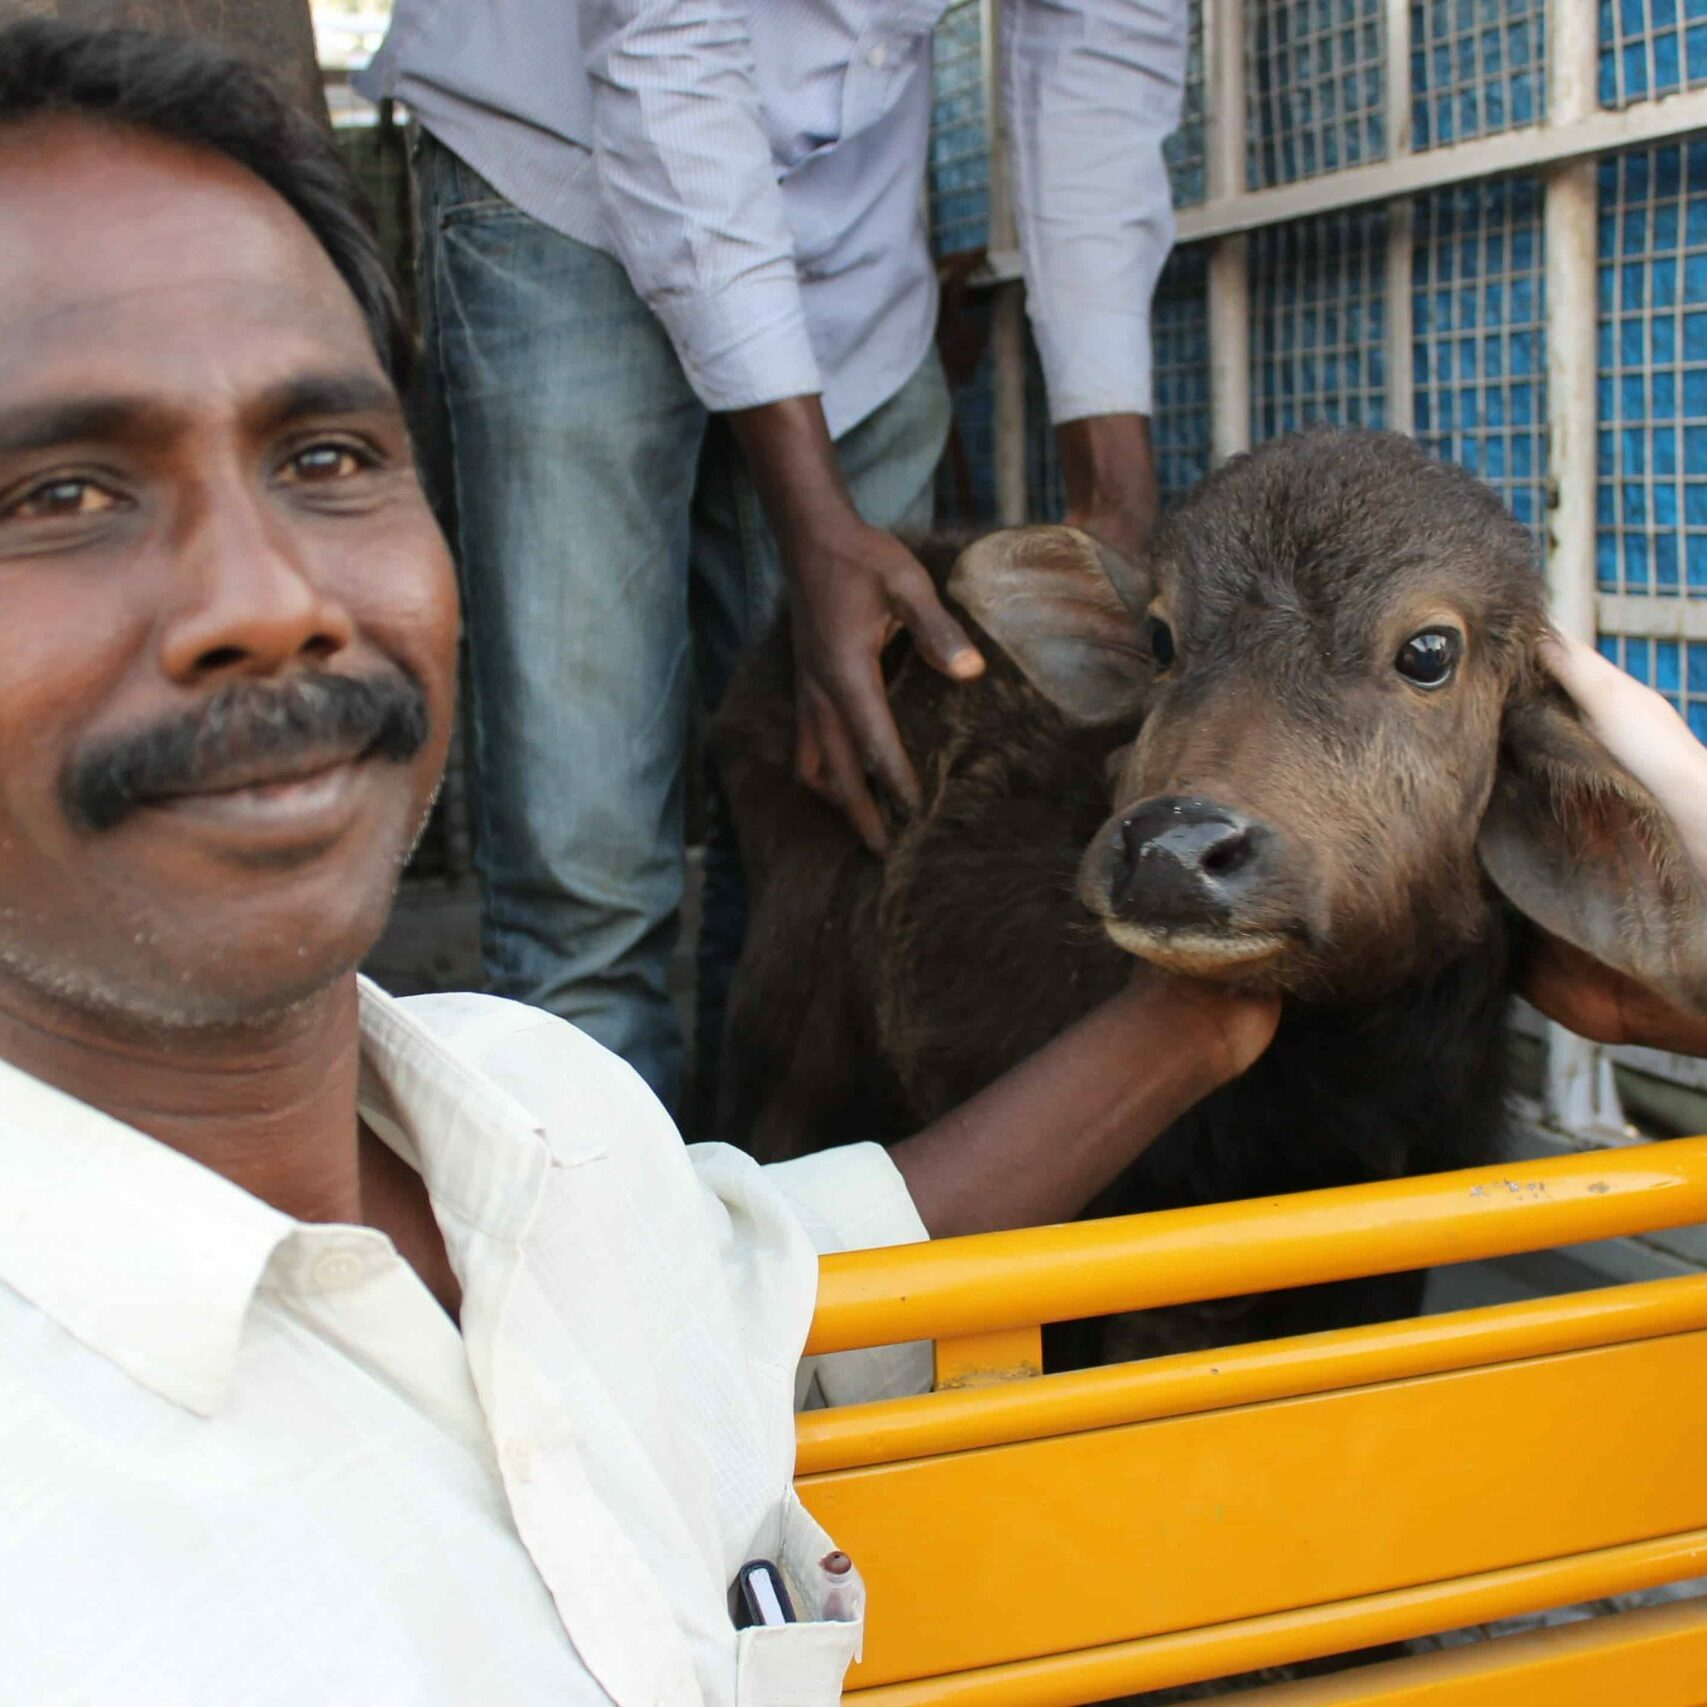 Cow_450